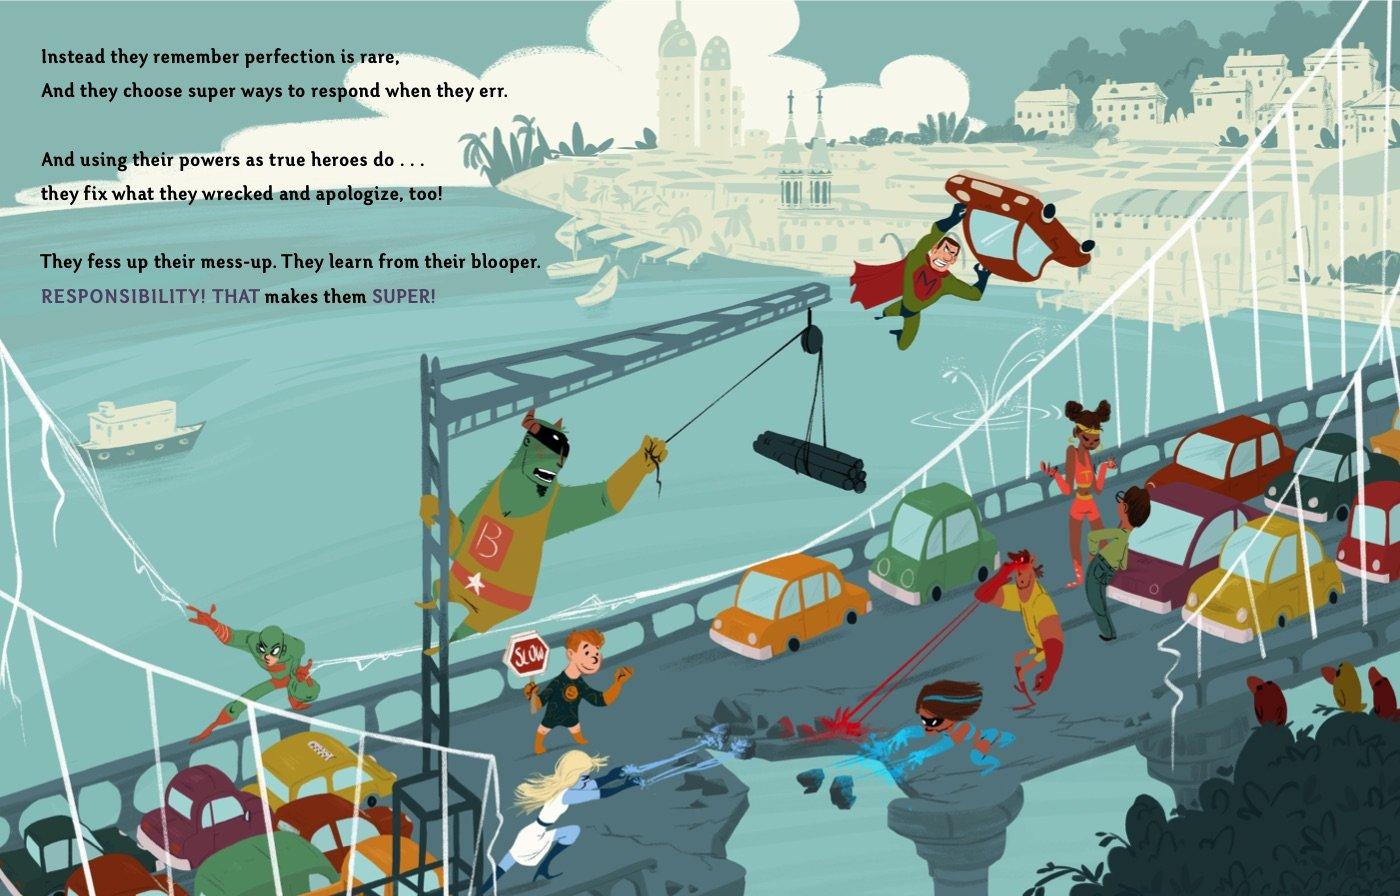 celebrate-picture-books-picture-book-review-even-superheroes-make-mistakes-bridge